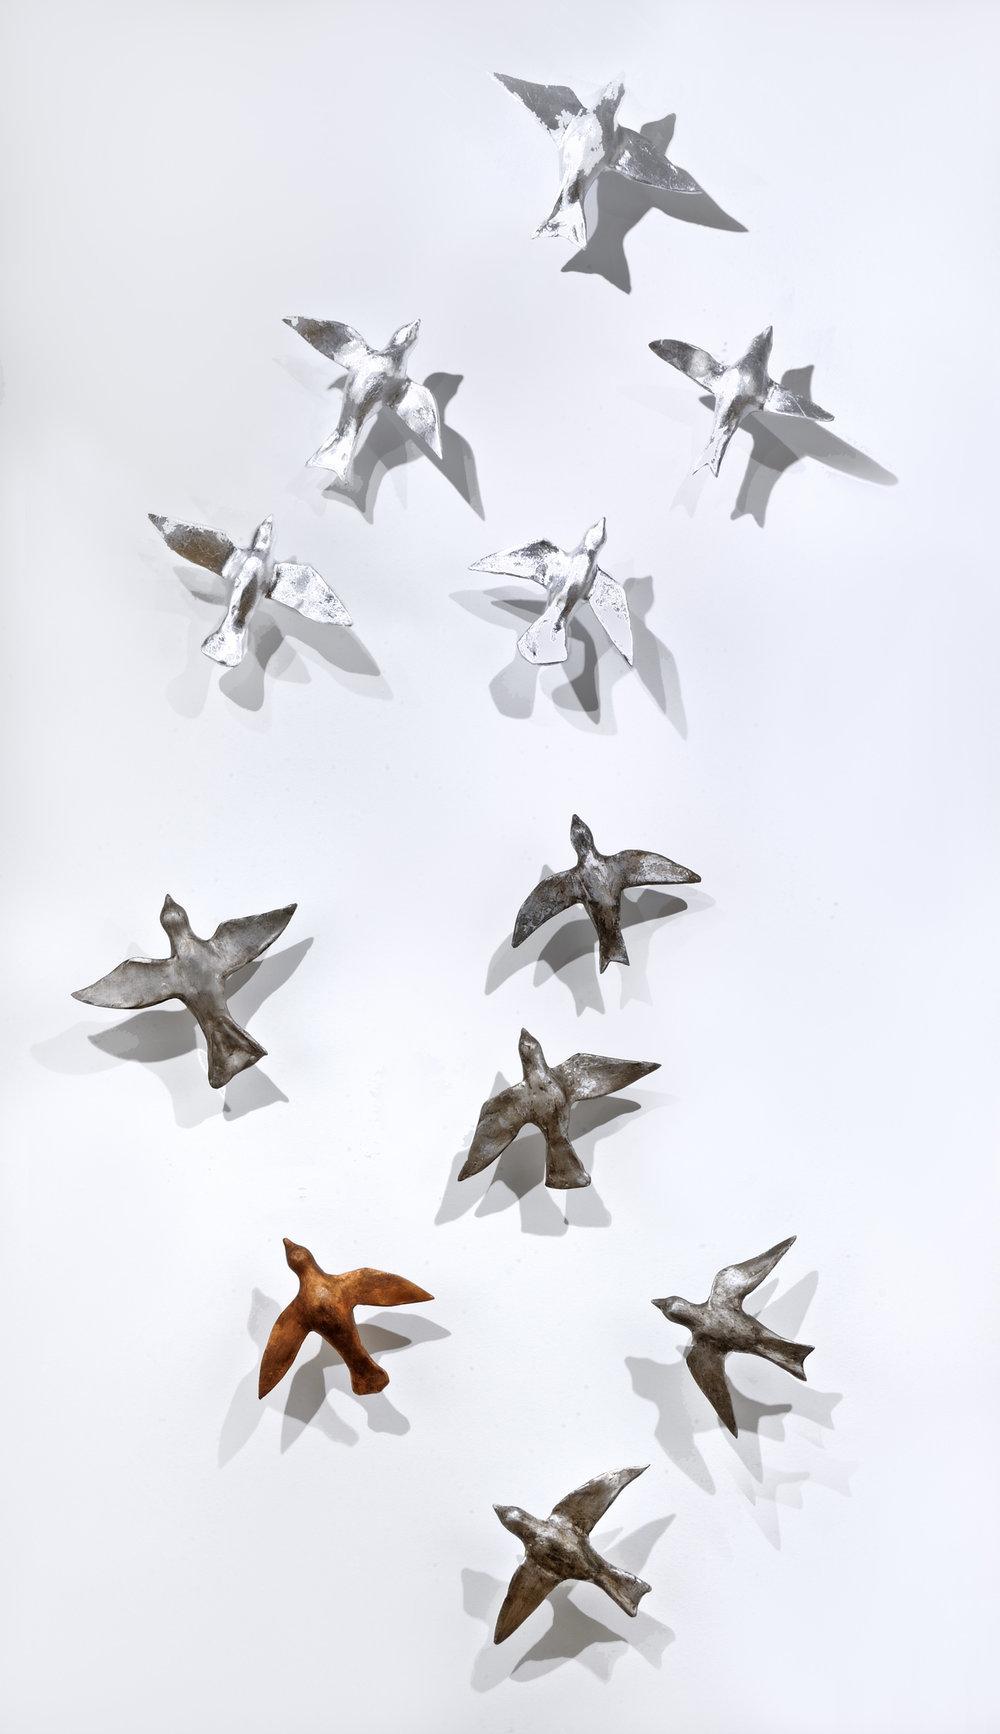 Hostetler_Sunlit Birds_2017_clay with metal leaf_7x3ft_$2,500.jpg